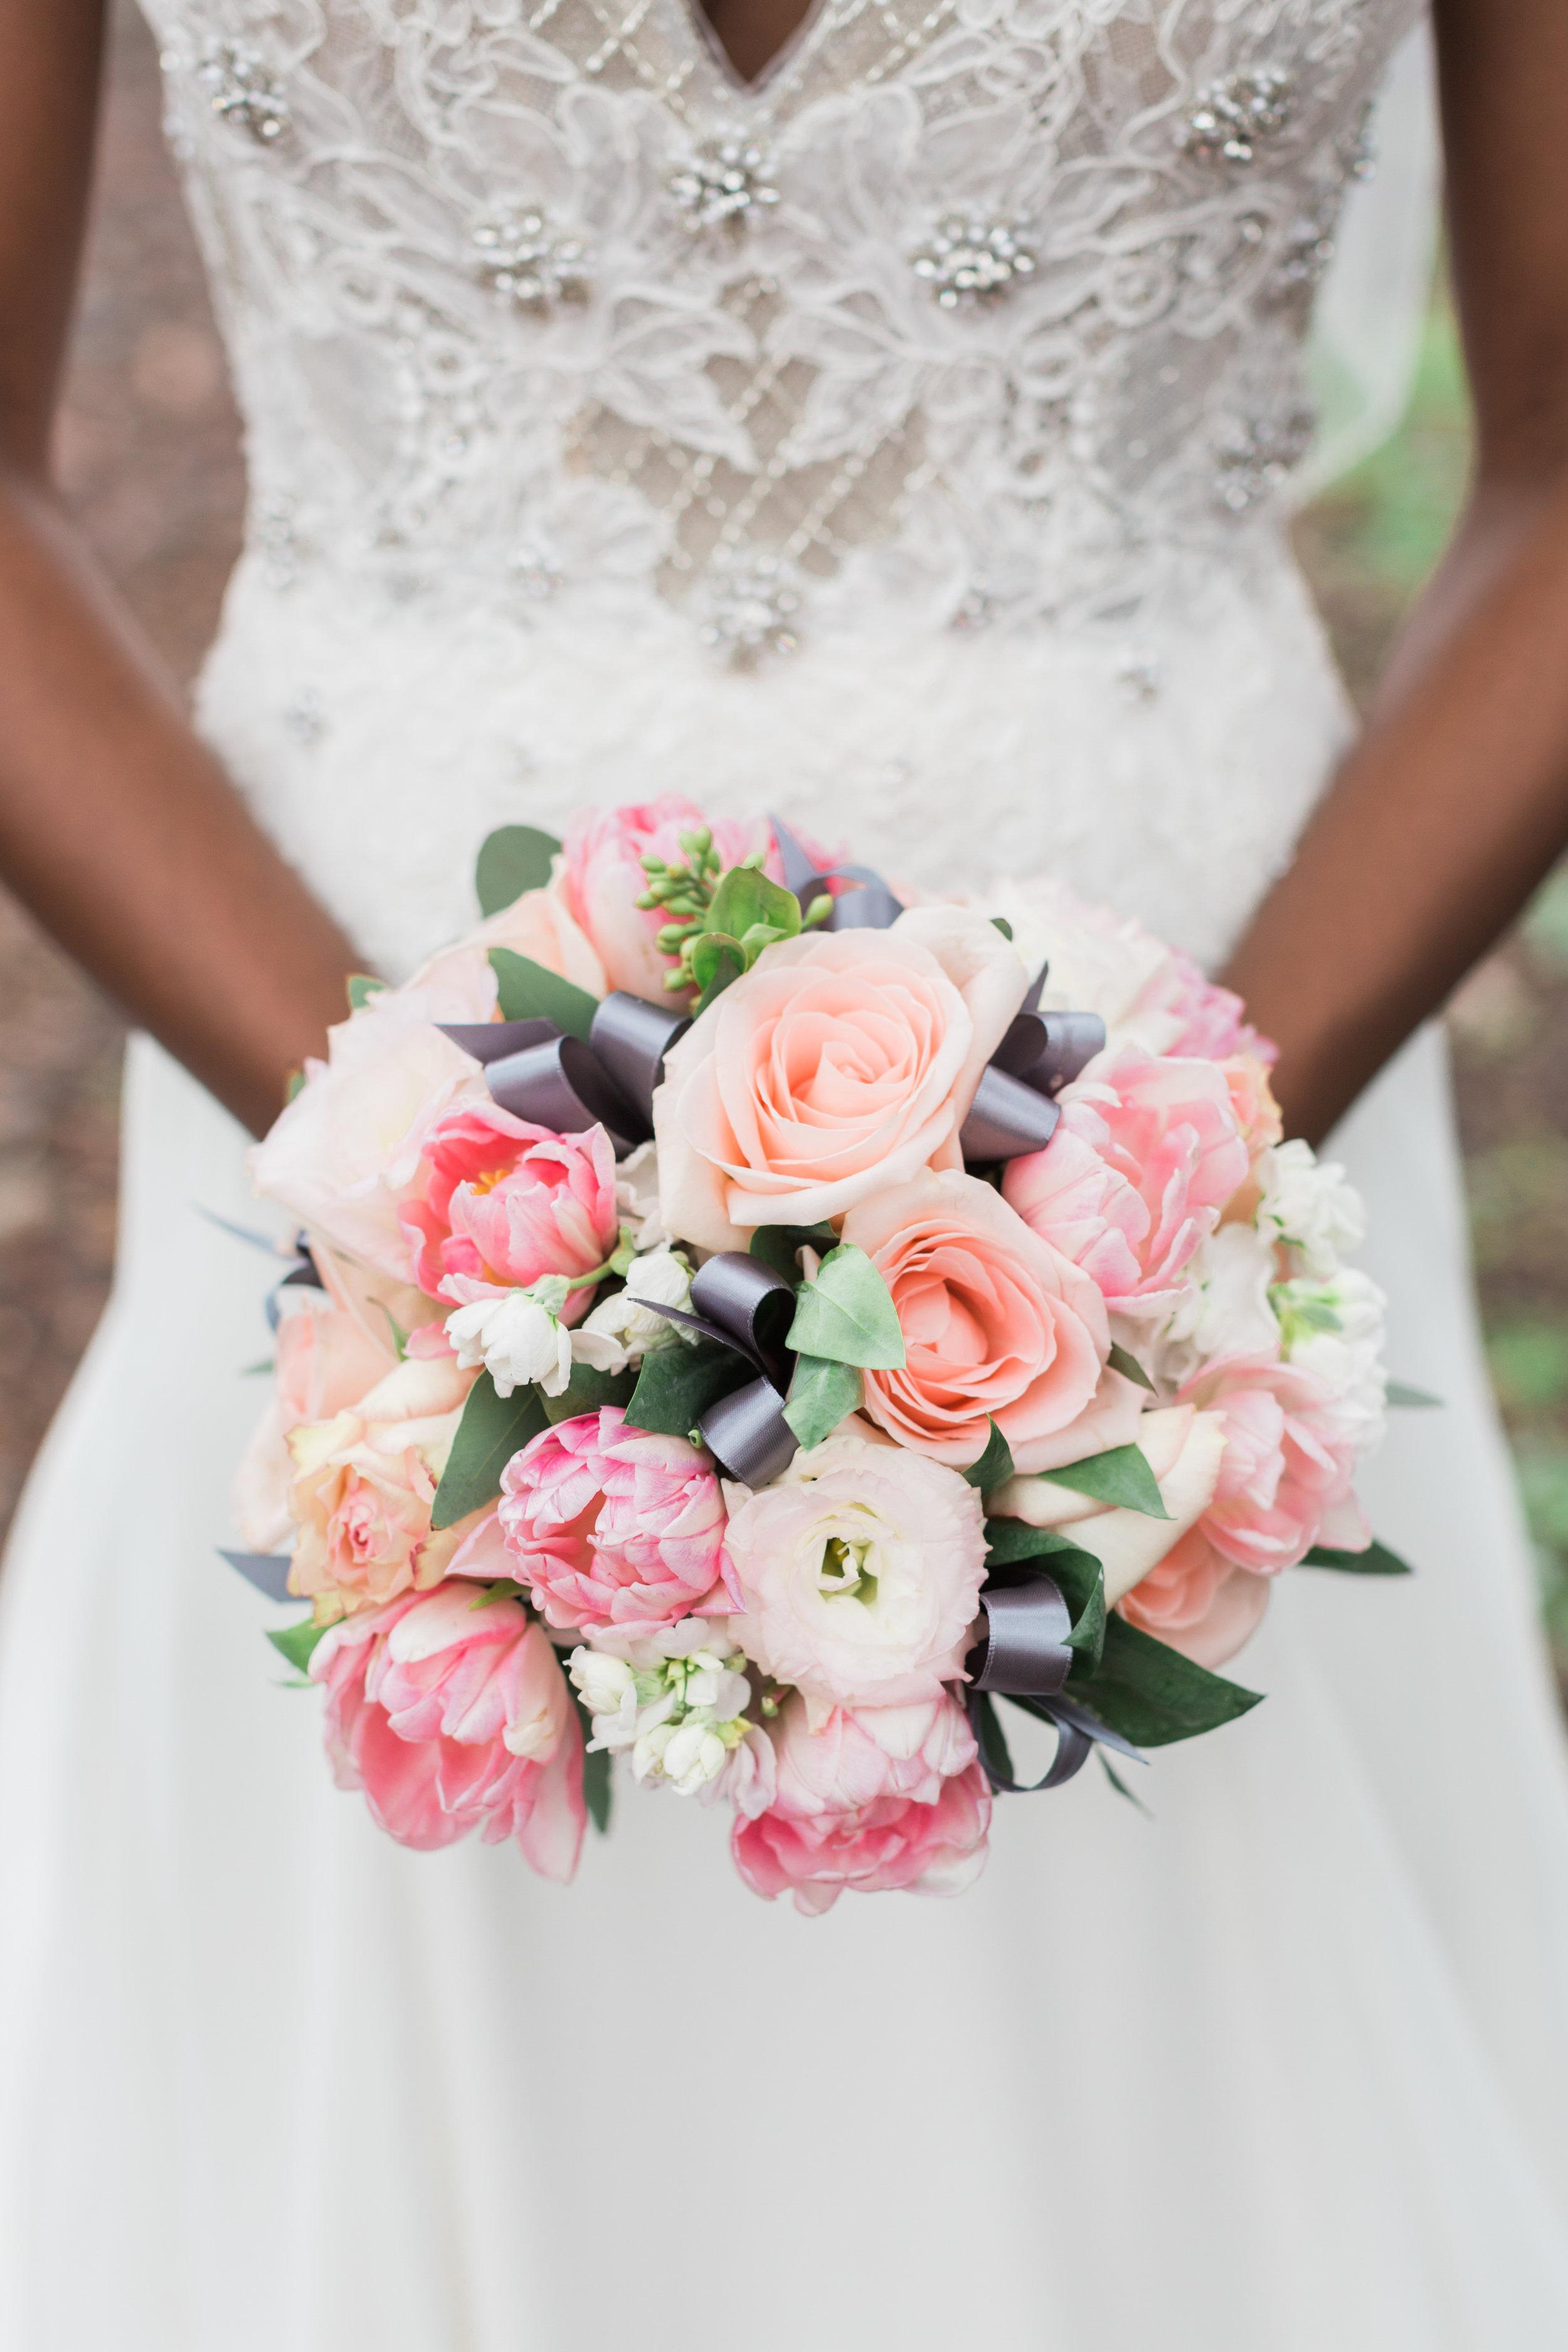 pastel-bouquet-wedding-flowers.jpg